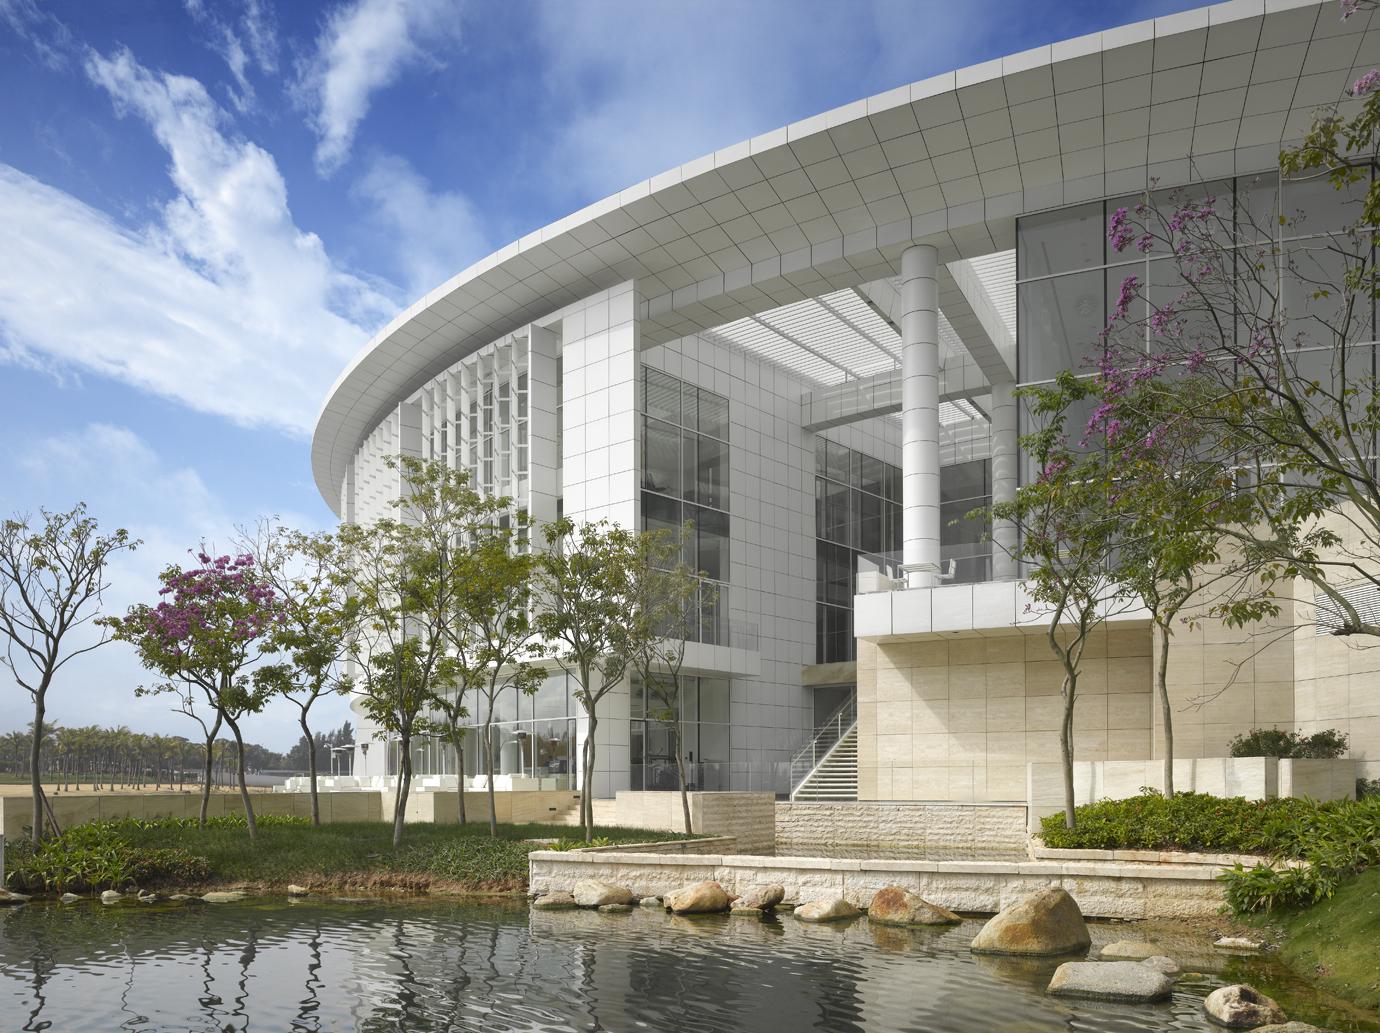 OCT Shenzhen Clubhouse / Richard Meier Architects